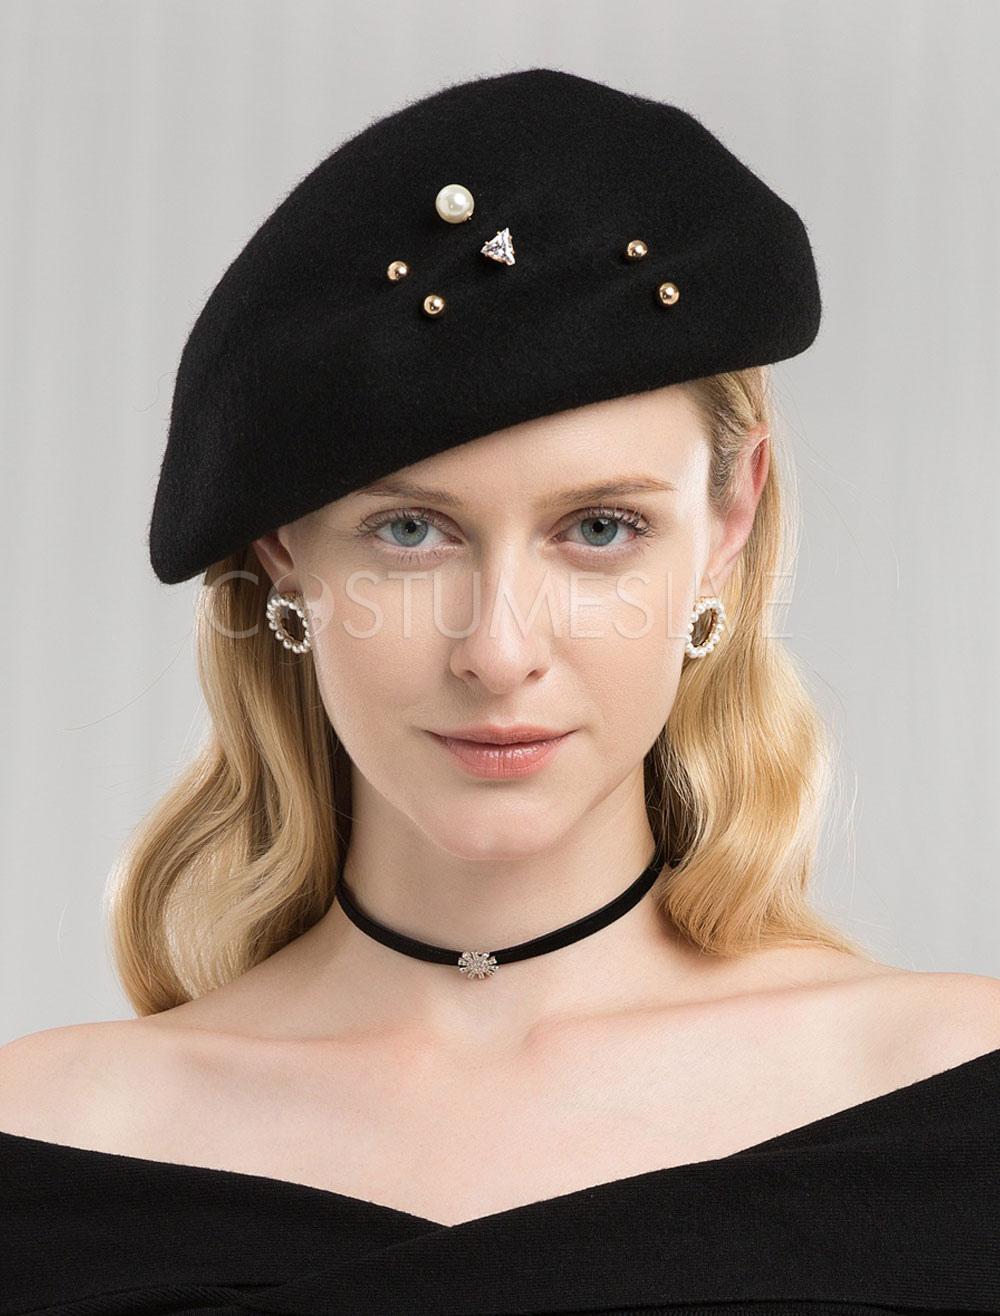 3a306697c061bf Black Wool Hat Retro Beret Felt Hat Women Royal Hair Accessories Winter  Vintage Headpieces - Costumeslive.com by Milanoo